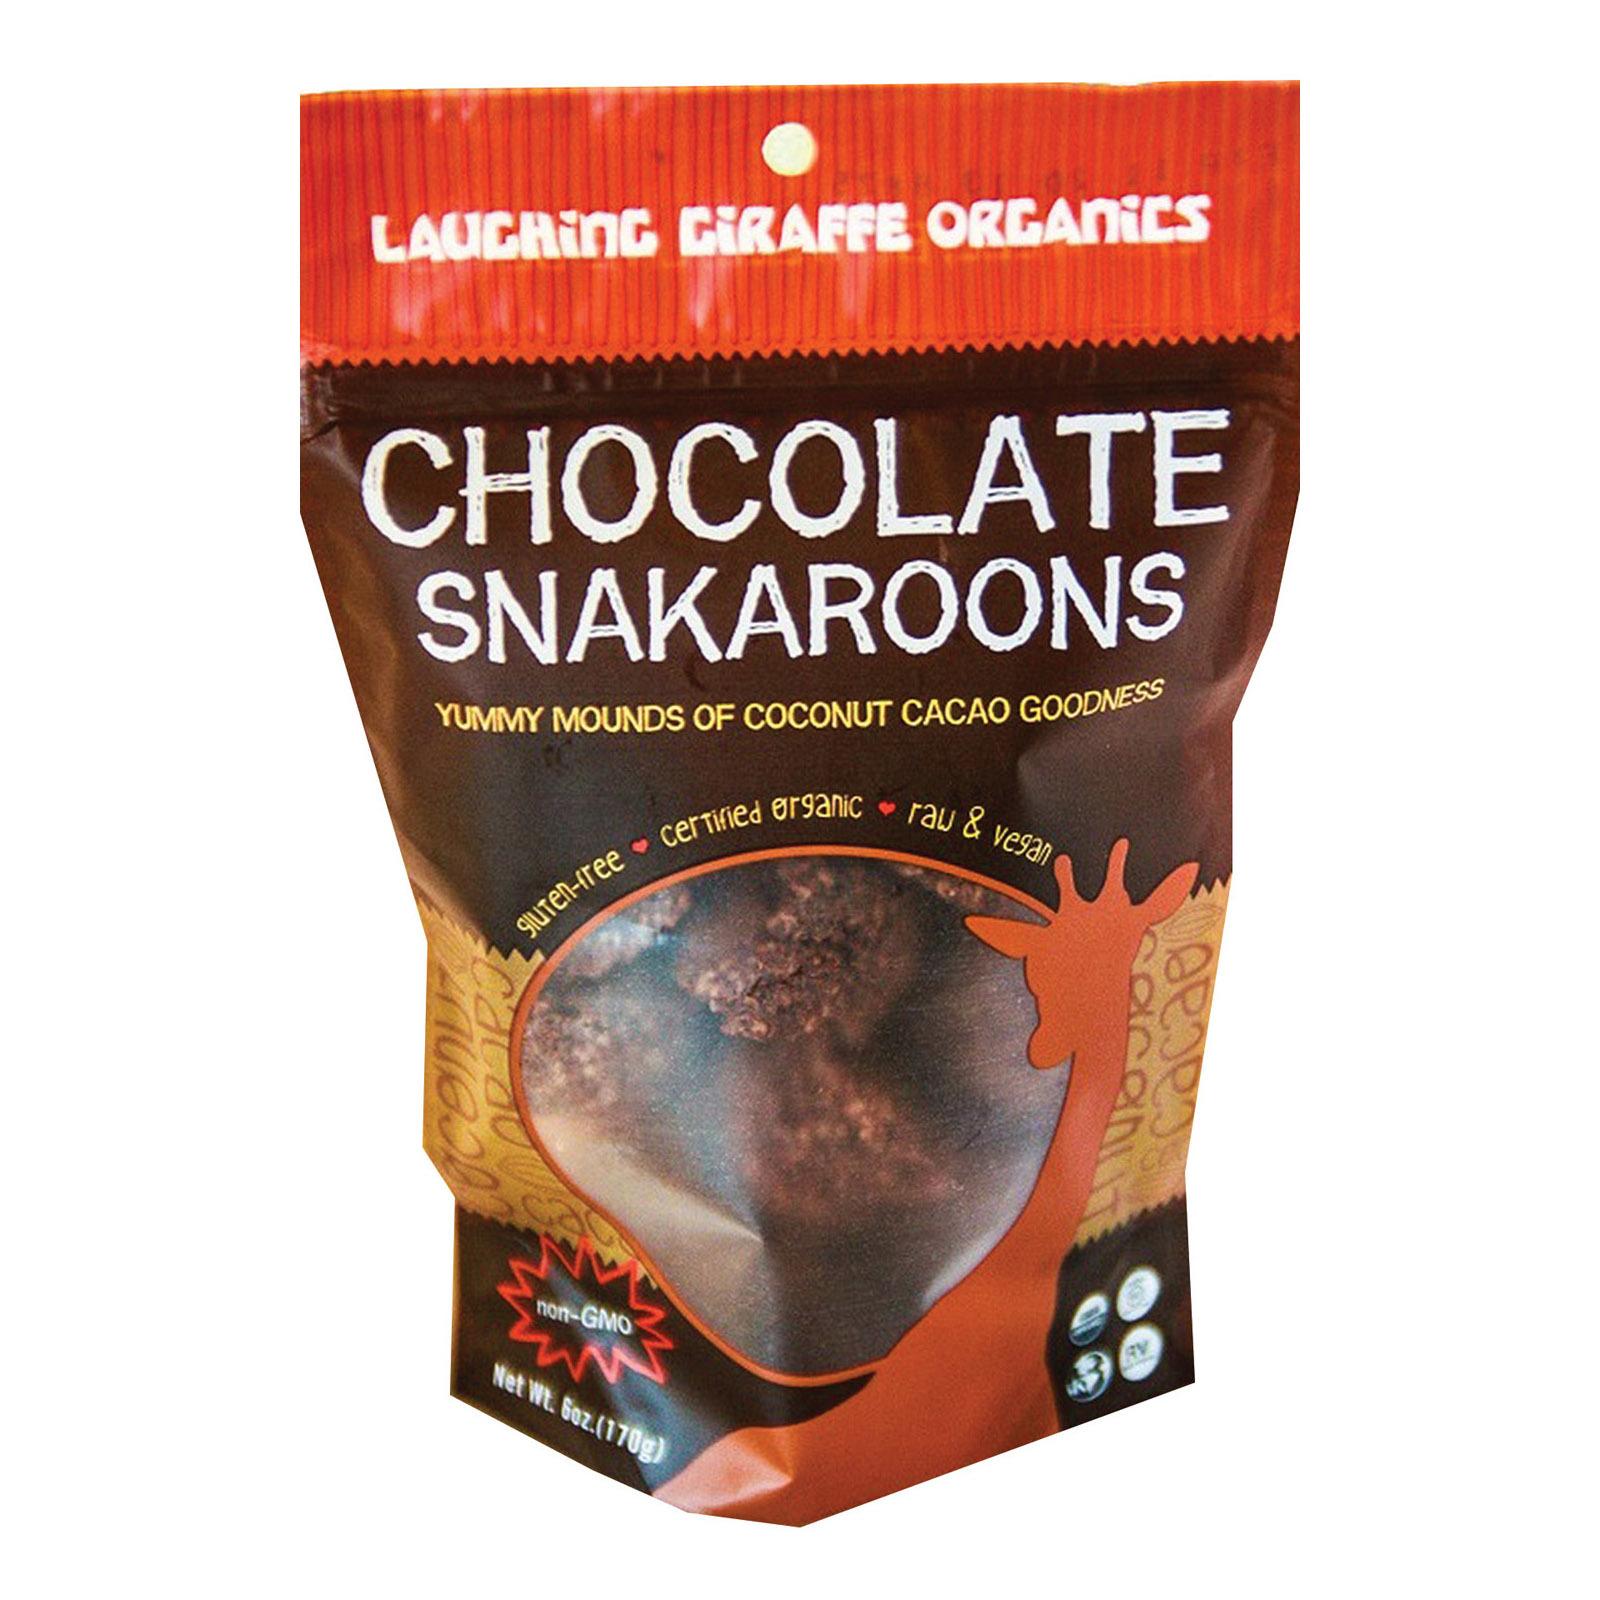 Laughing Giraffe Organics Snakaroons - Chocolate - Case of 8 - 6 oz.